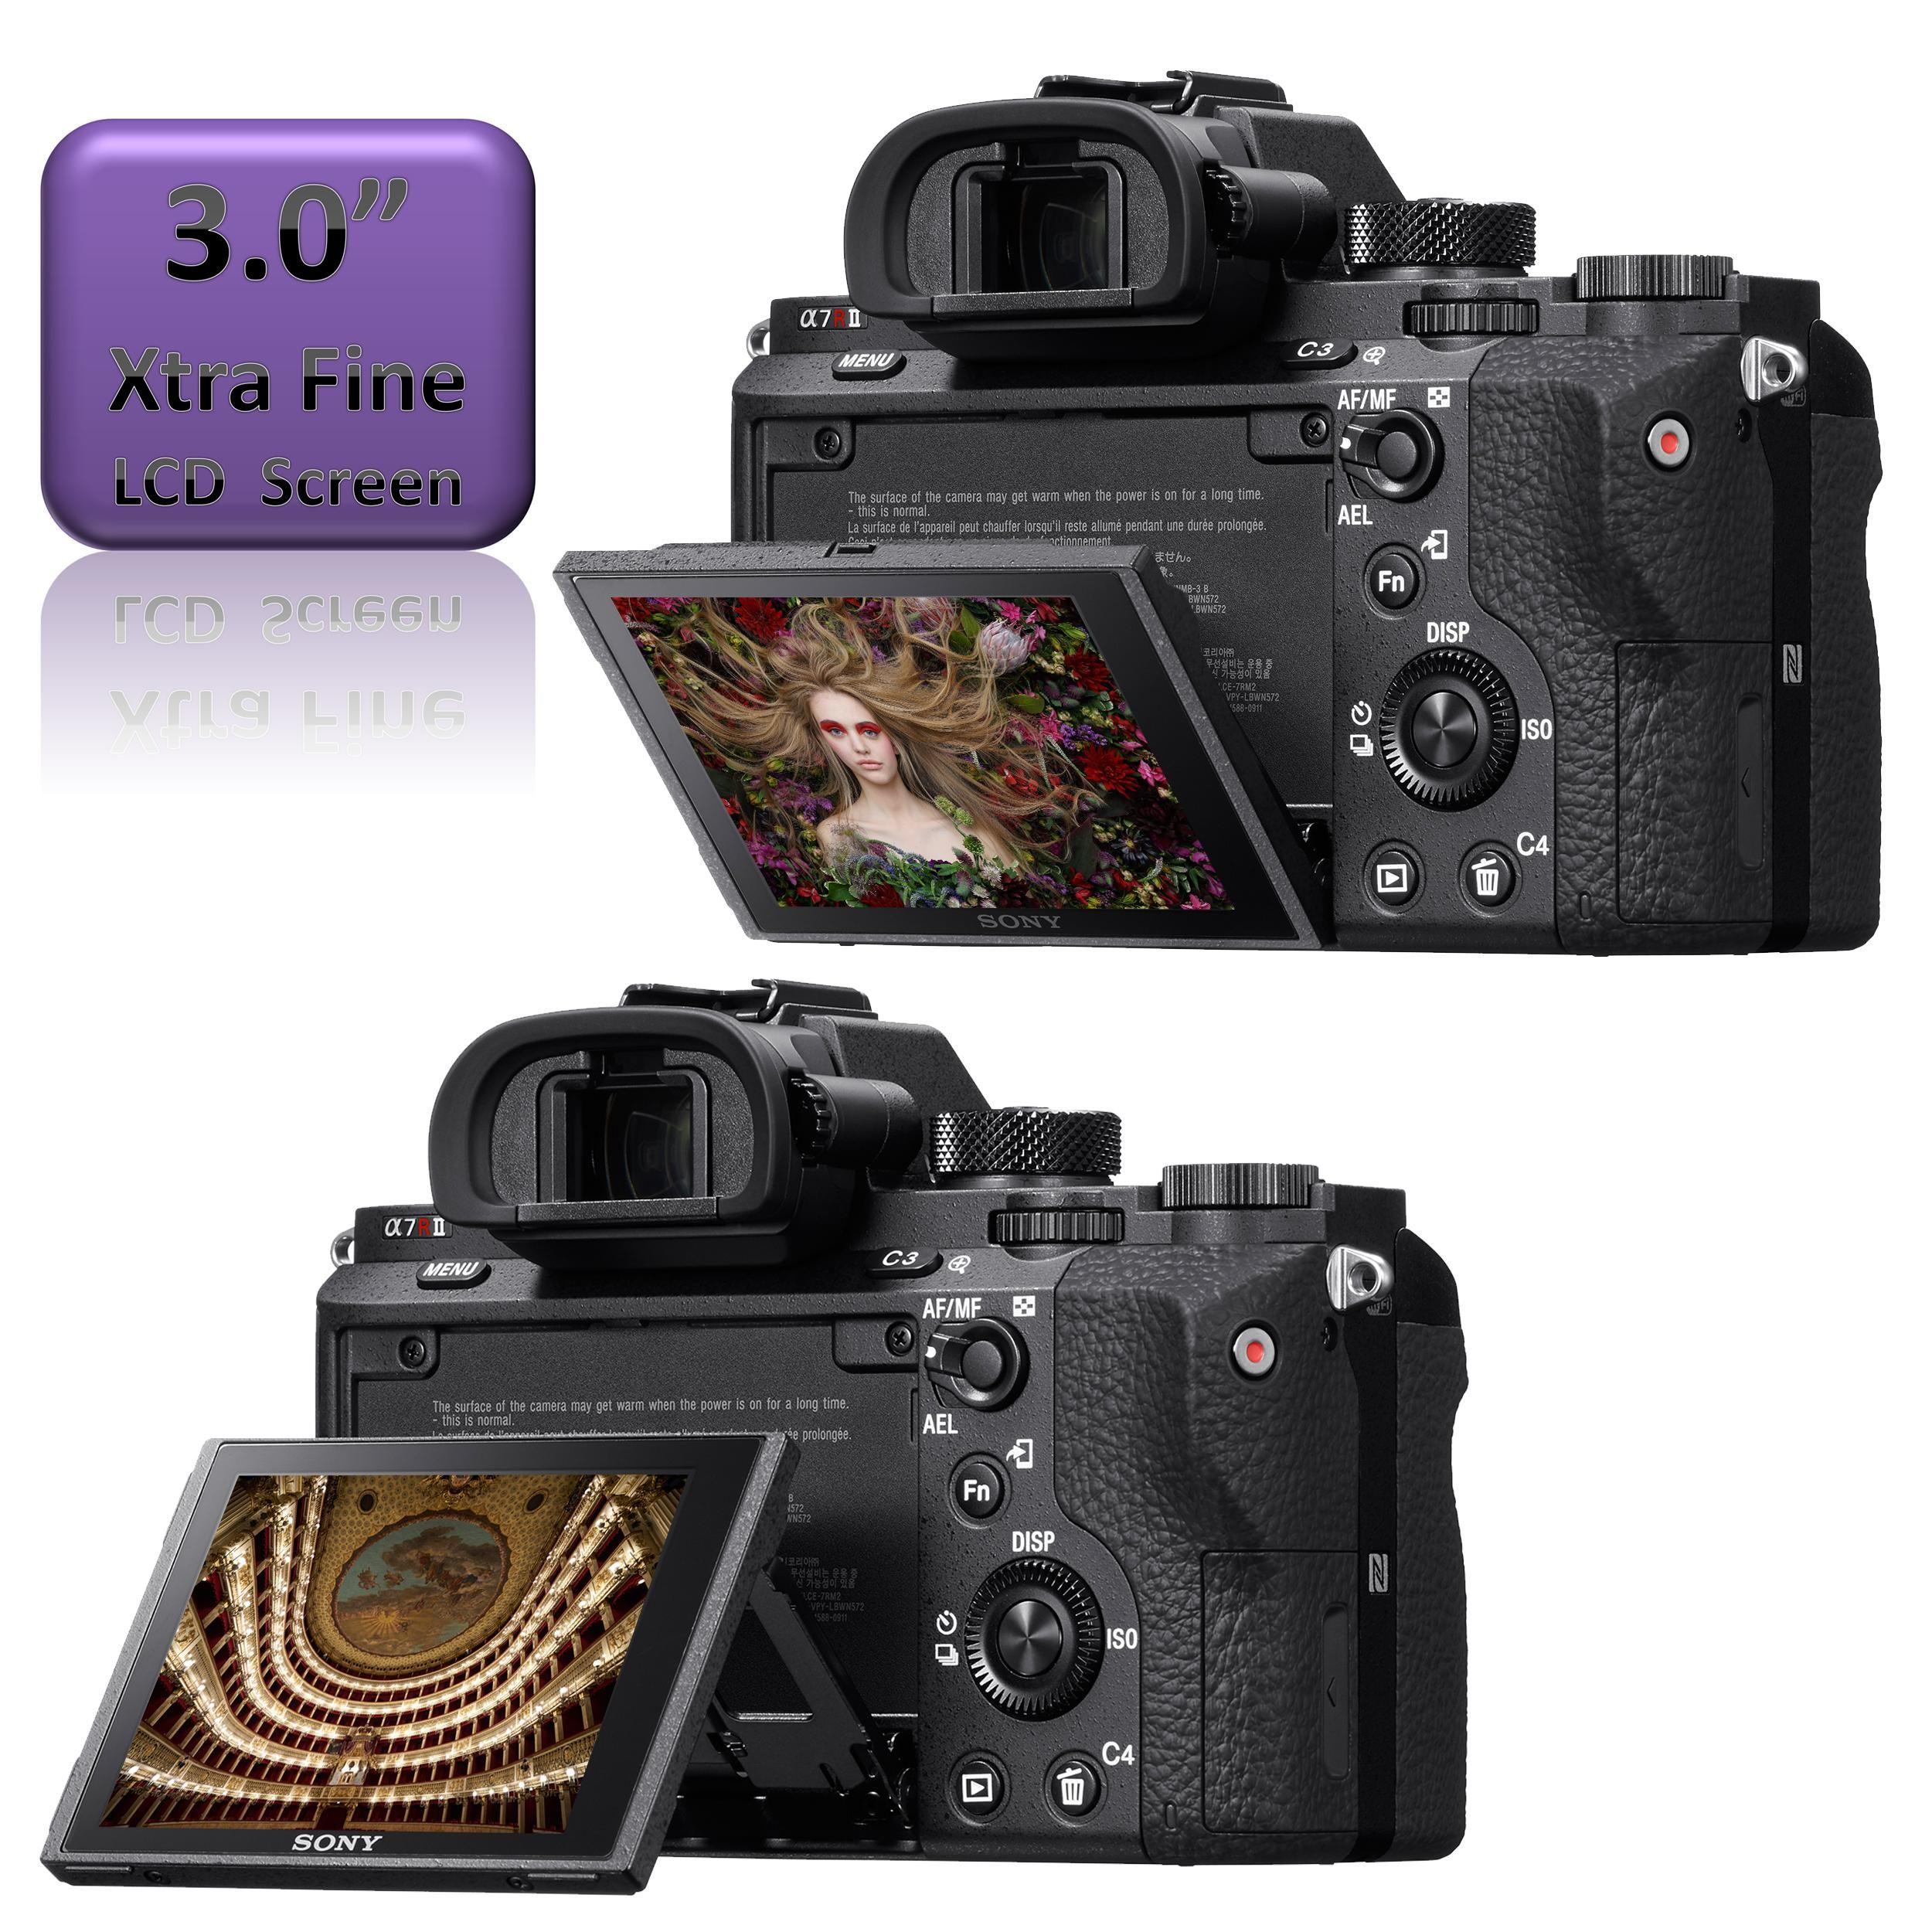 Amazon.com : Sony a7R II Full-Frame Mirrorless Interchangeable Lens ...